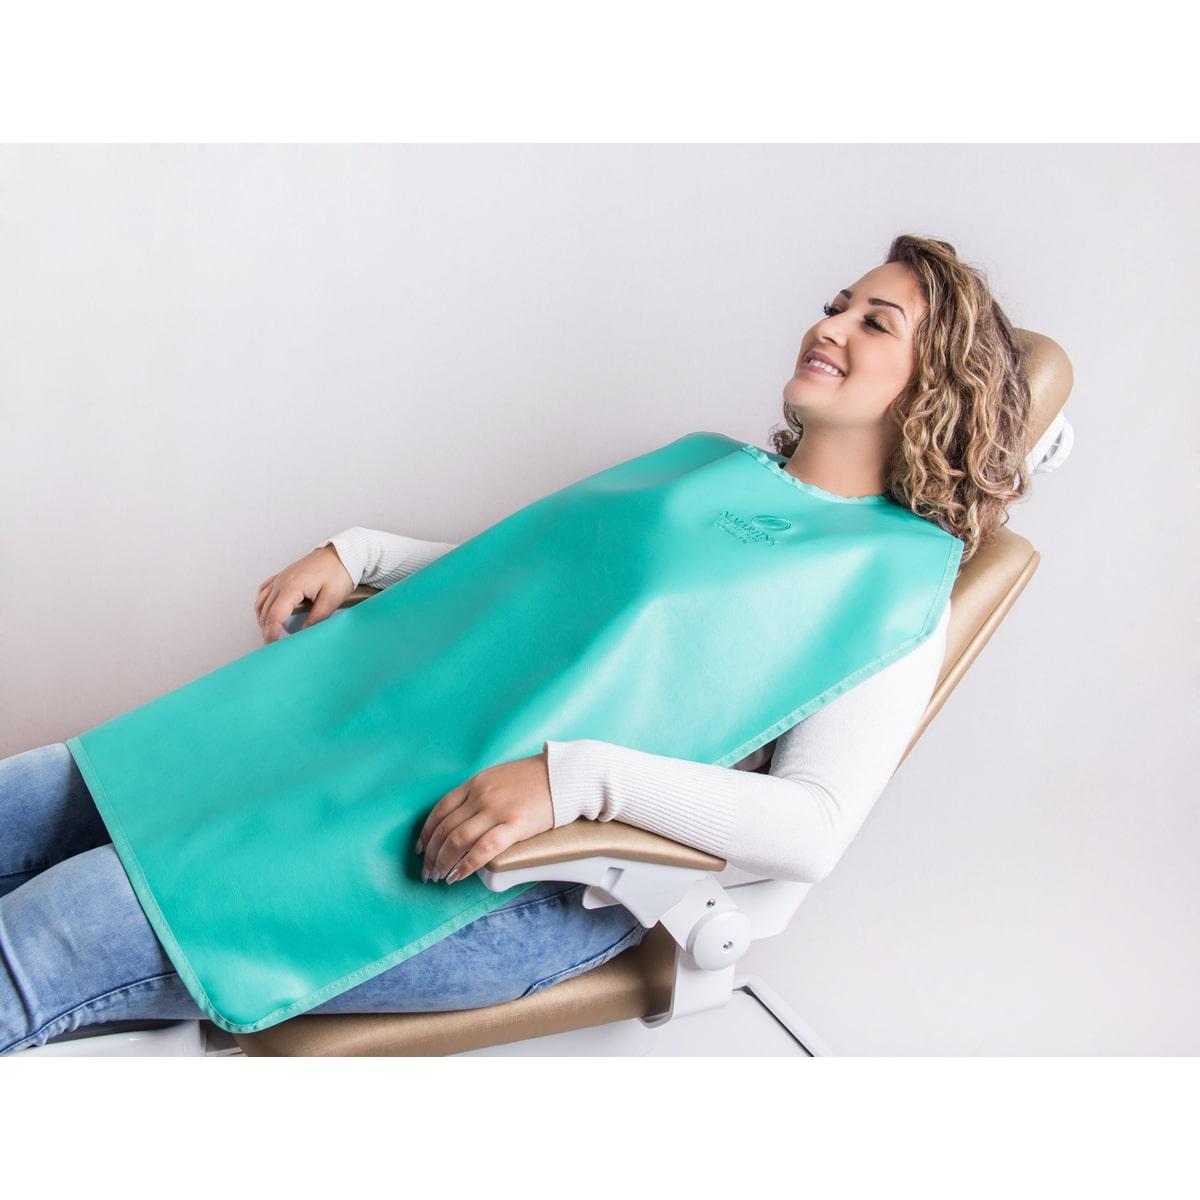 Avental Periapical sem protetor de tireoide - 100x60cm - 0,50mm/Pb - N.Martins